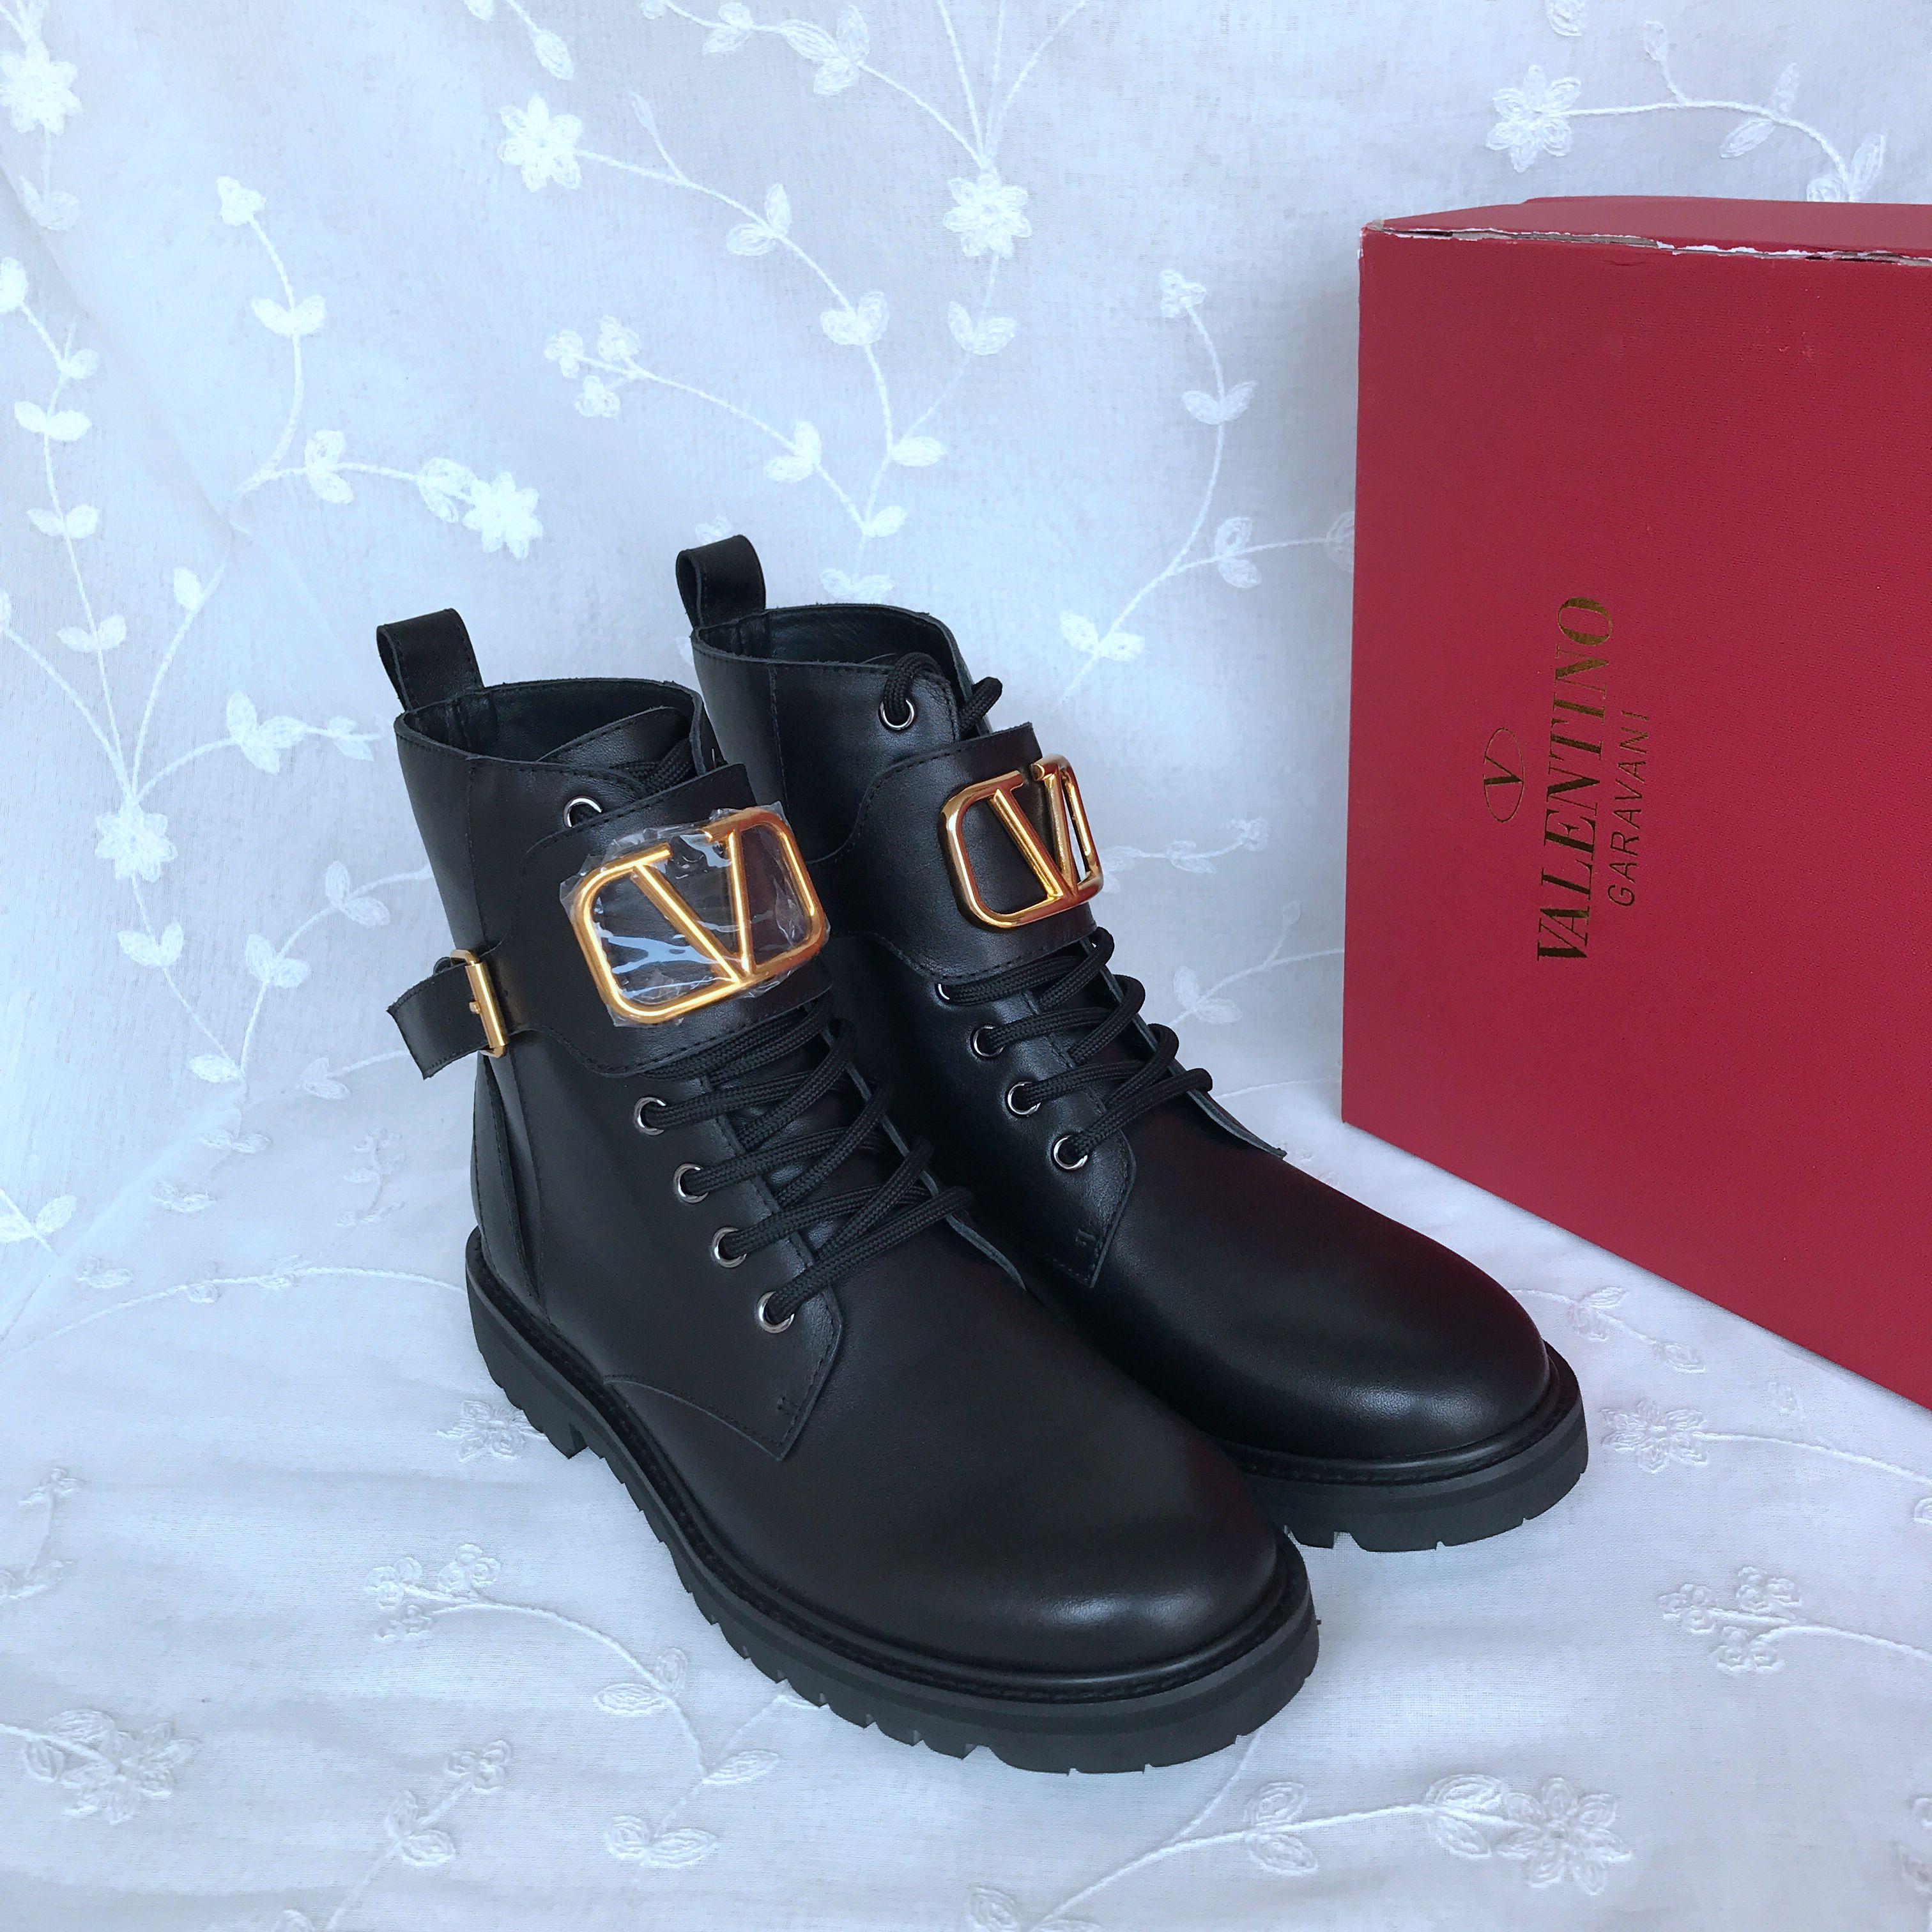 Valentino Boots 833275